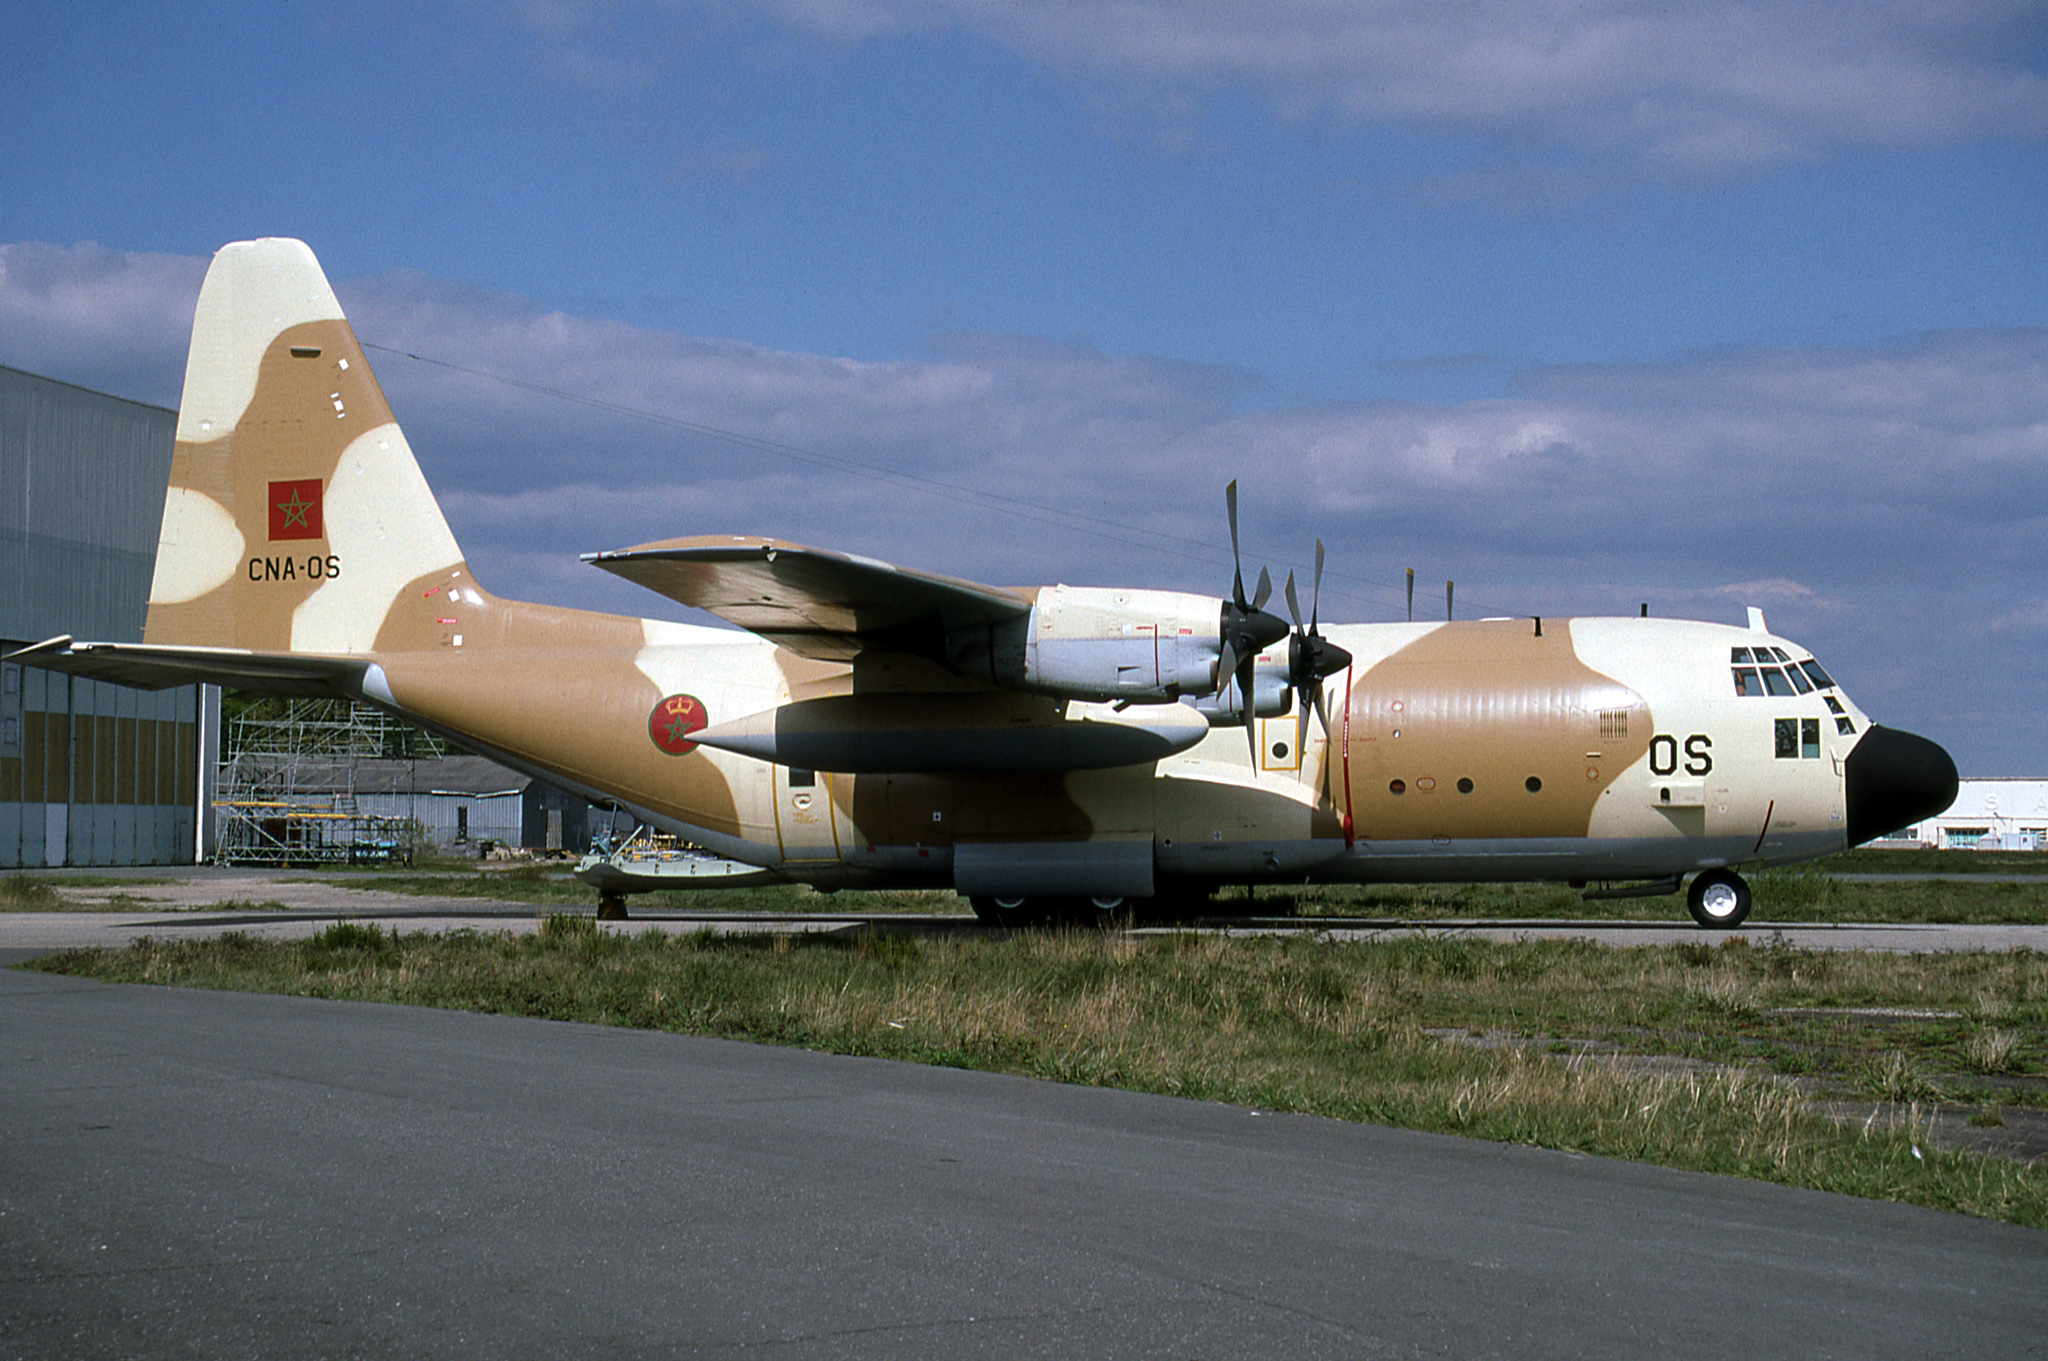 FRA: Photos d'avions de transport - Page 38 48463314441_0df0b77dfc_o